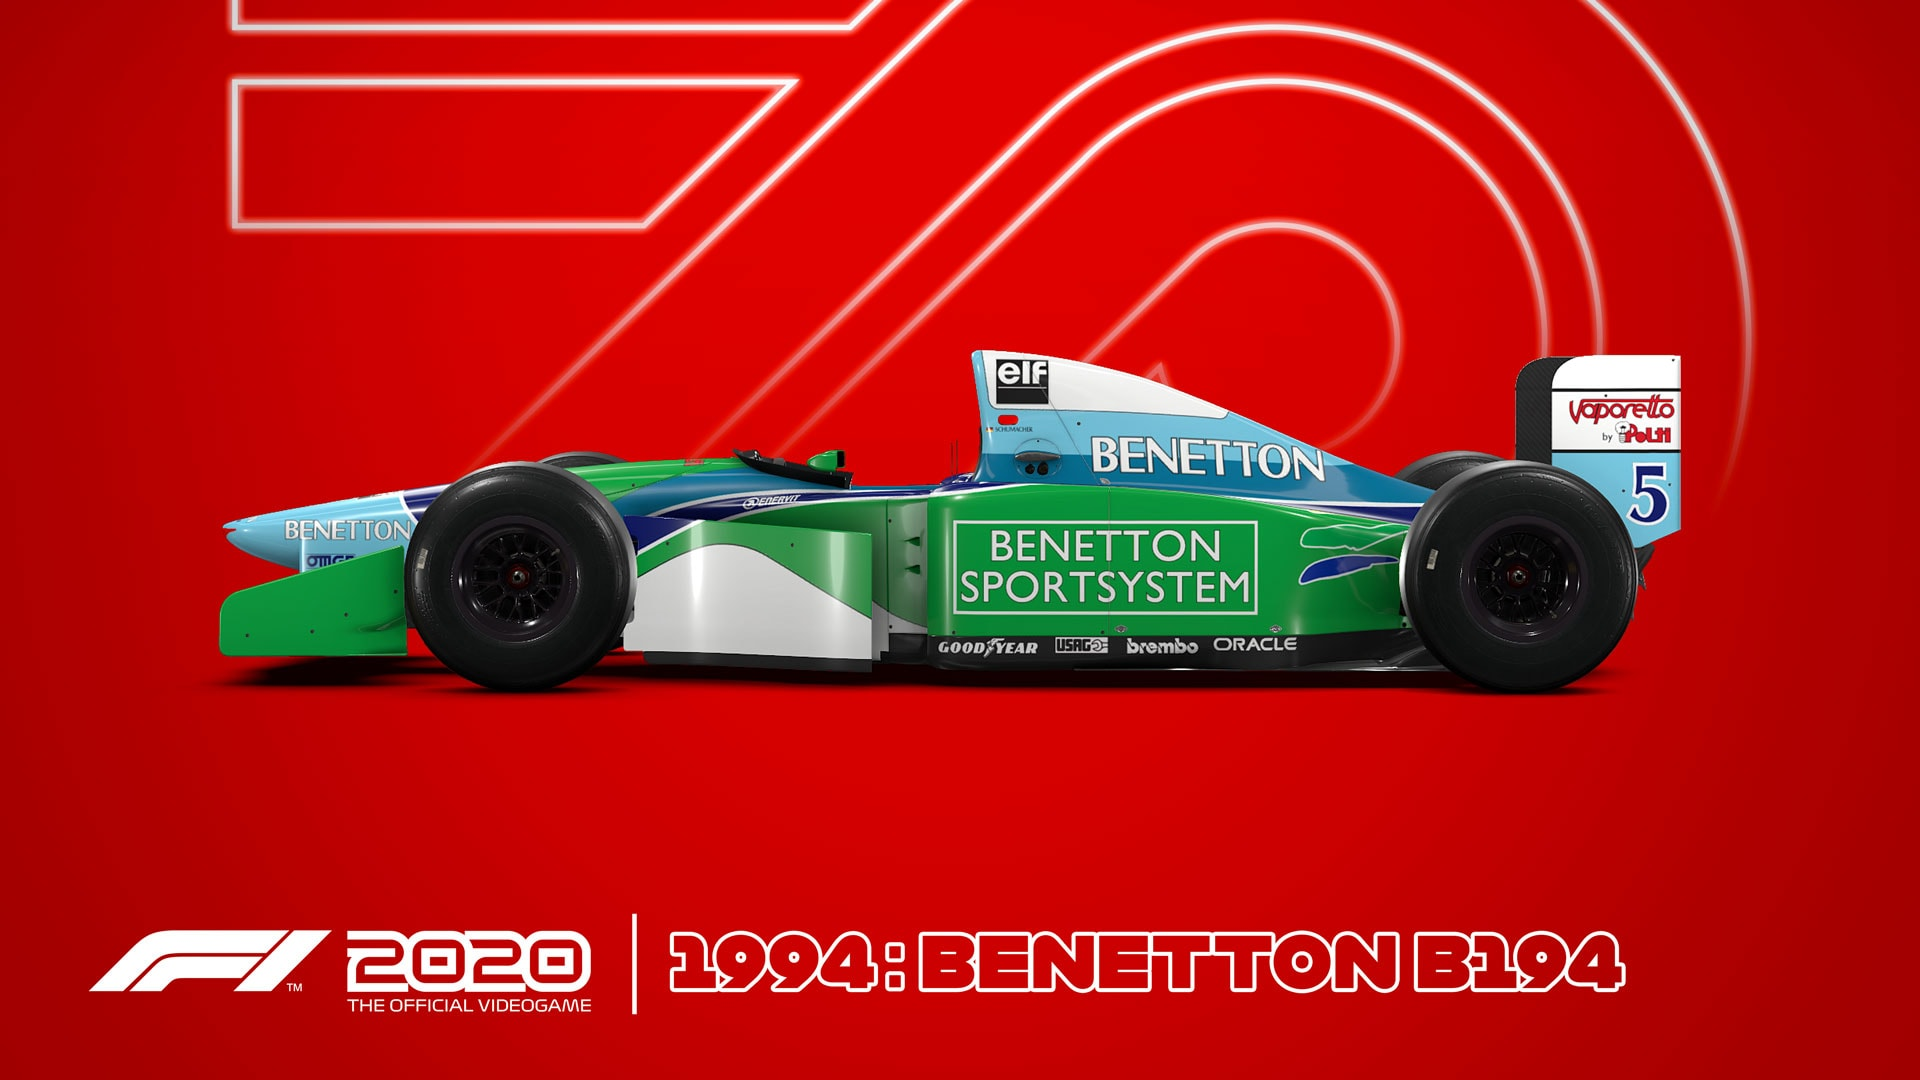 F12020_Benetton_94_16x9